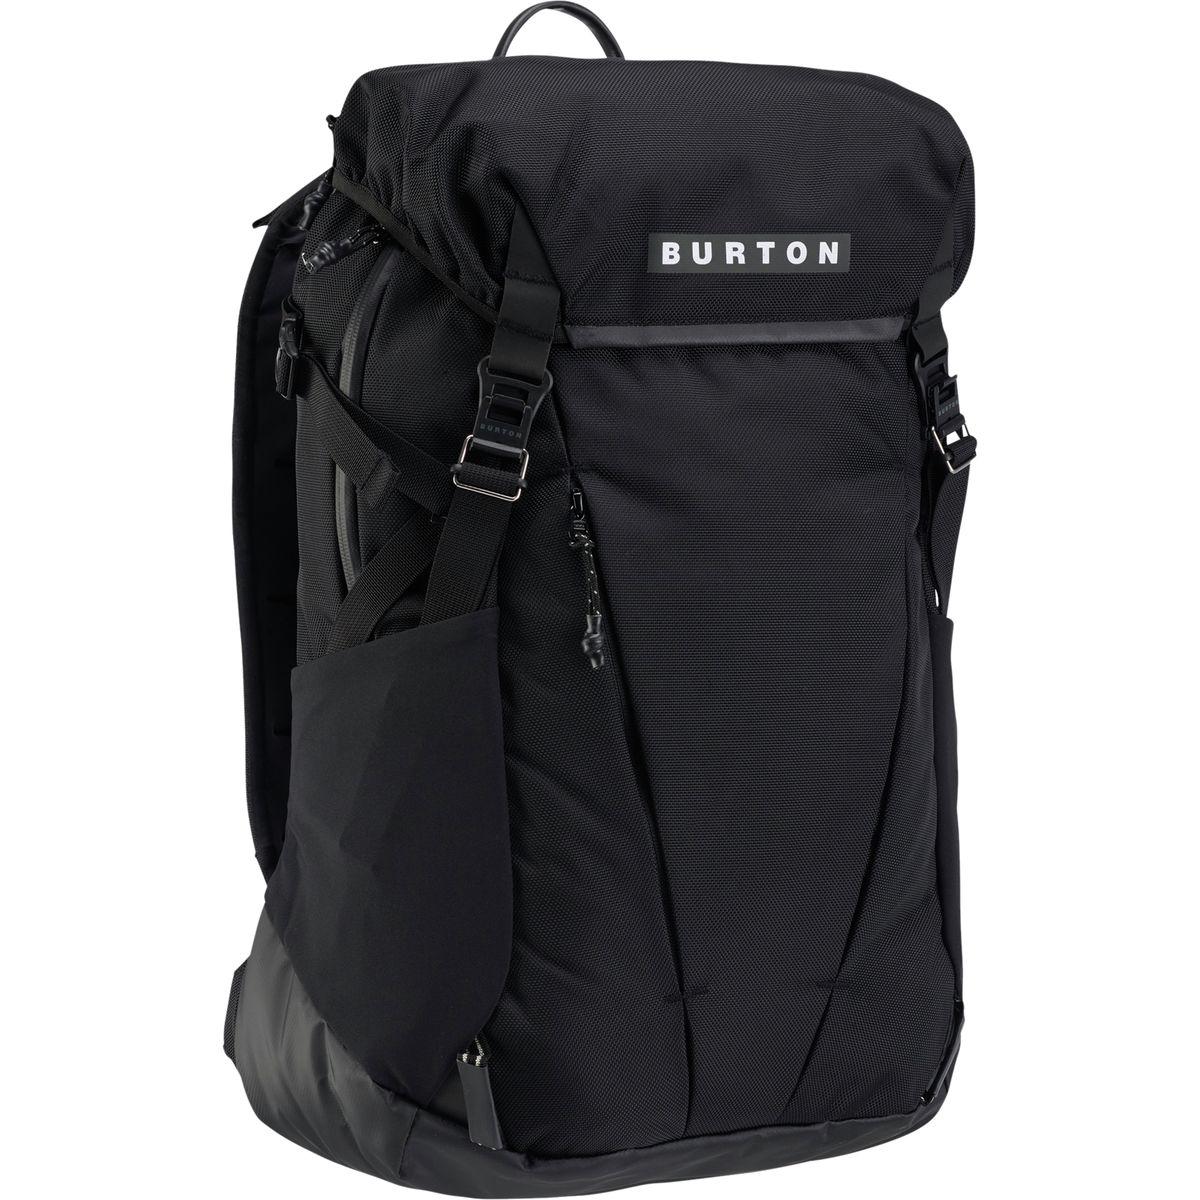 Burton Spruce 26L Backpack True Black Ballistic, One Size